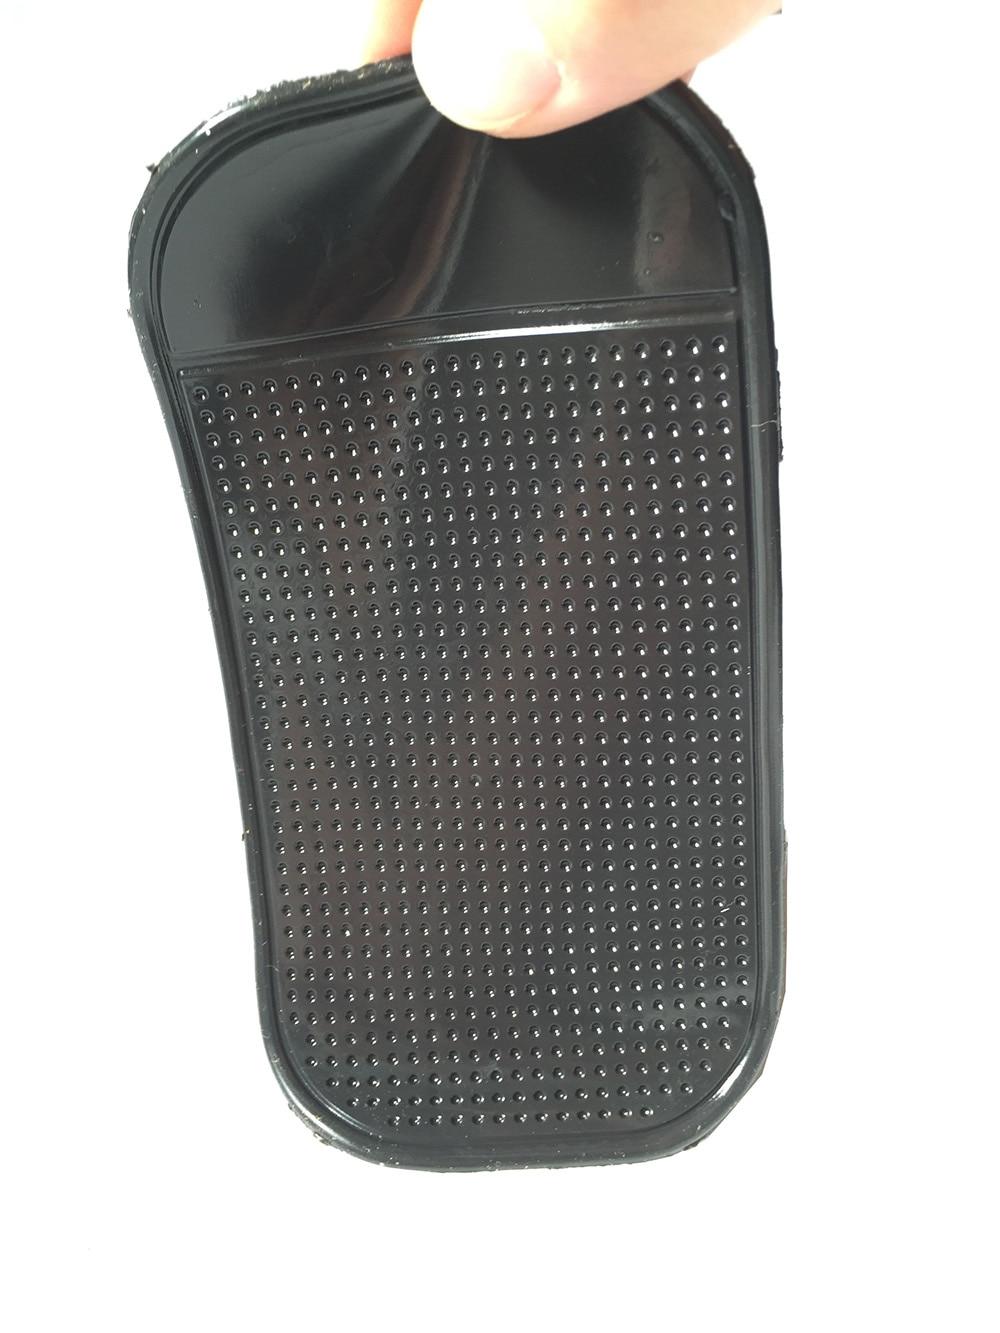 Anti Slip Mat : Hot universal car dashboard magic anti slip mat non